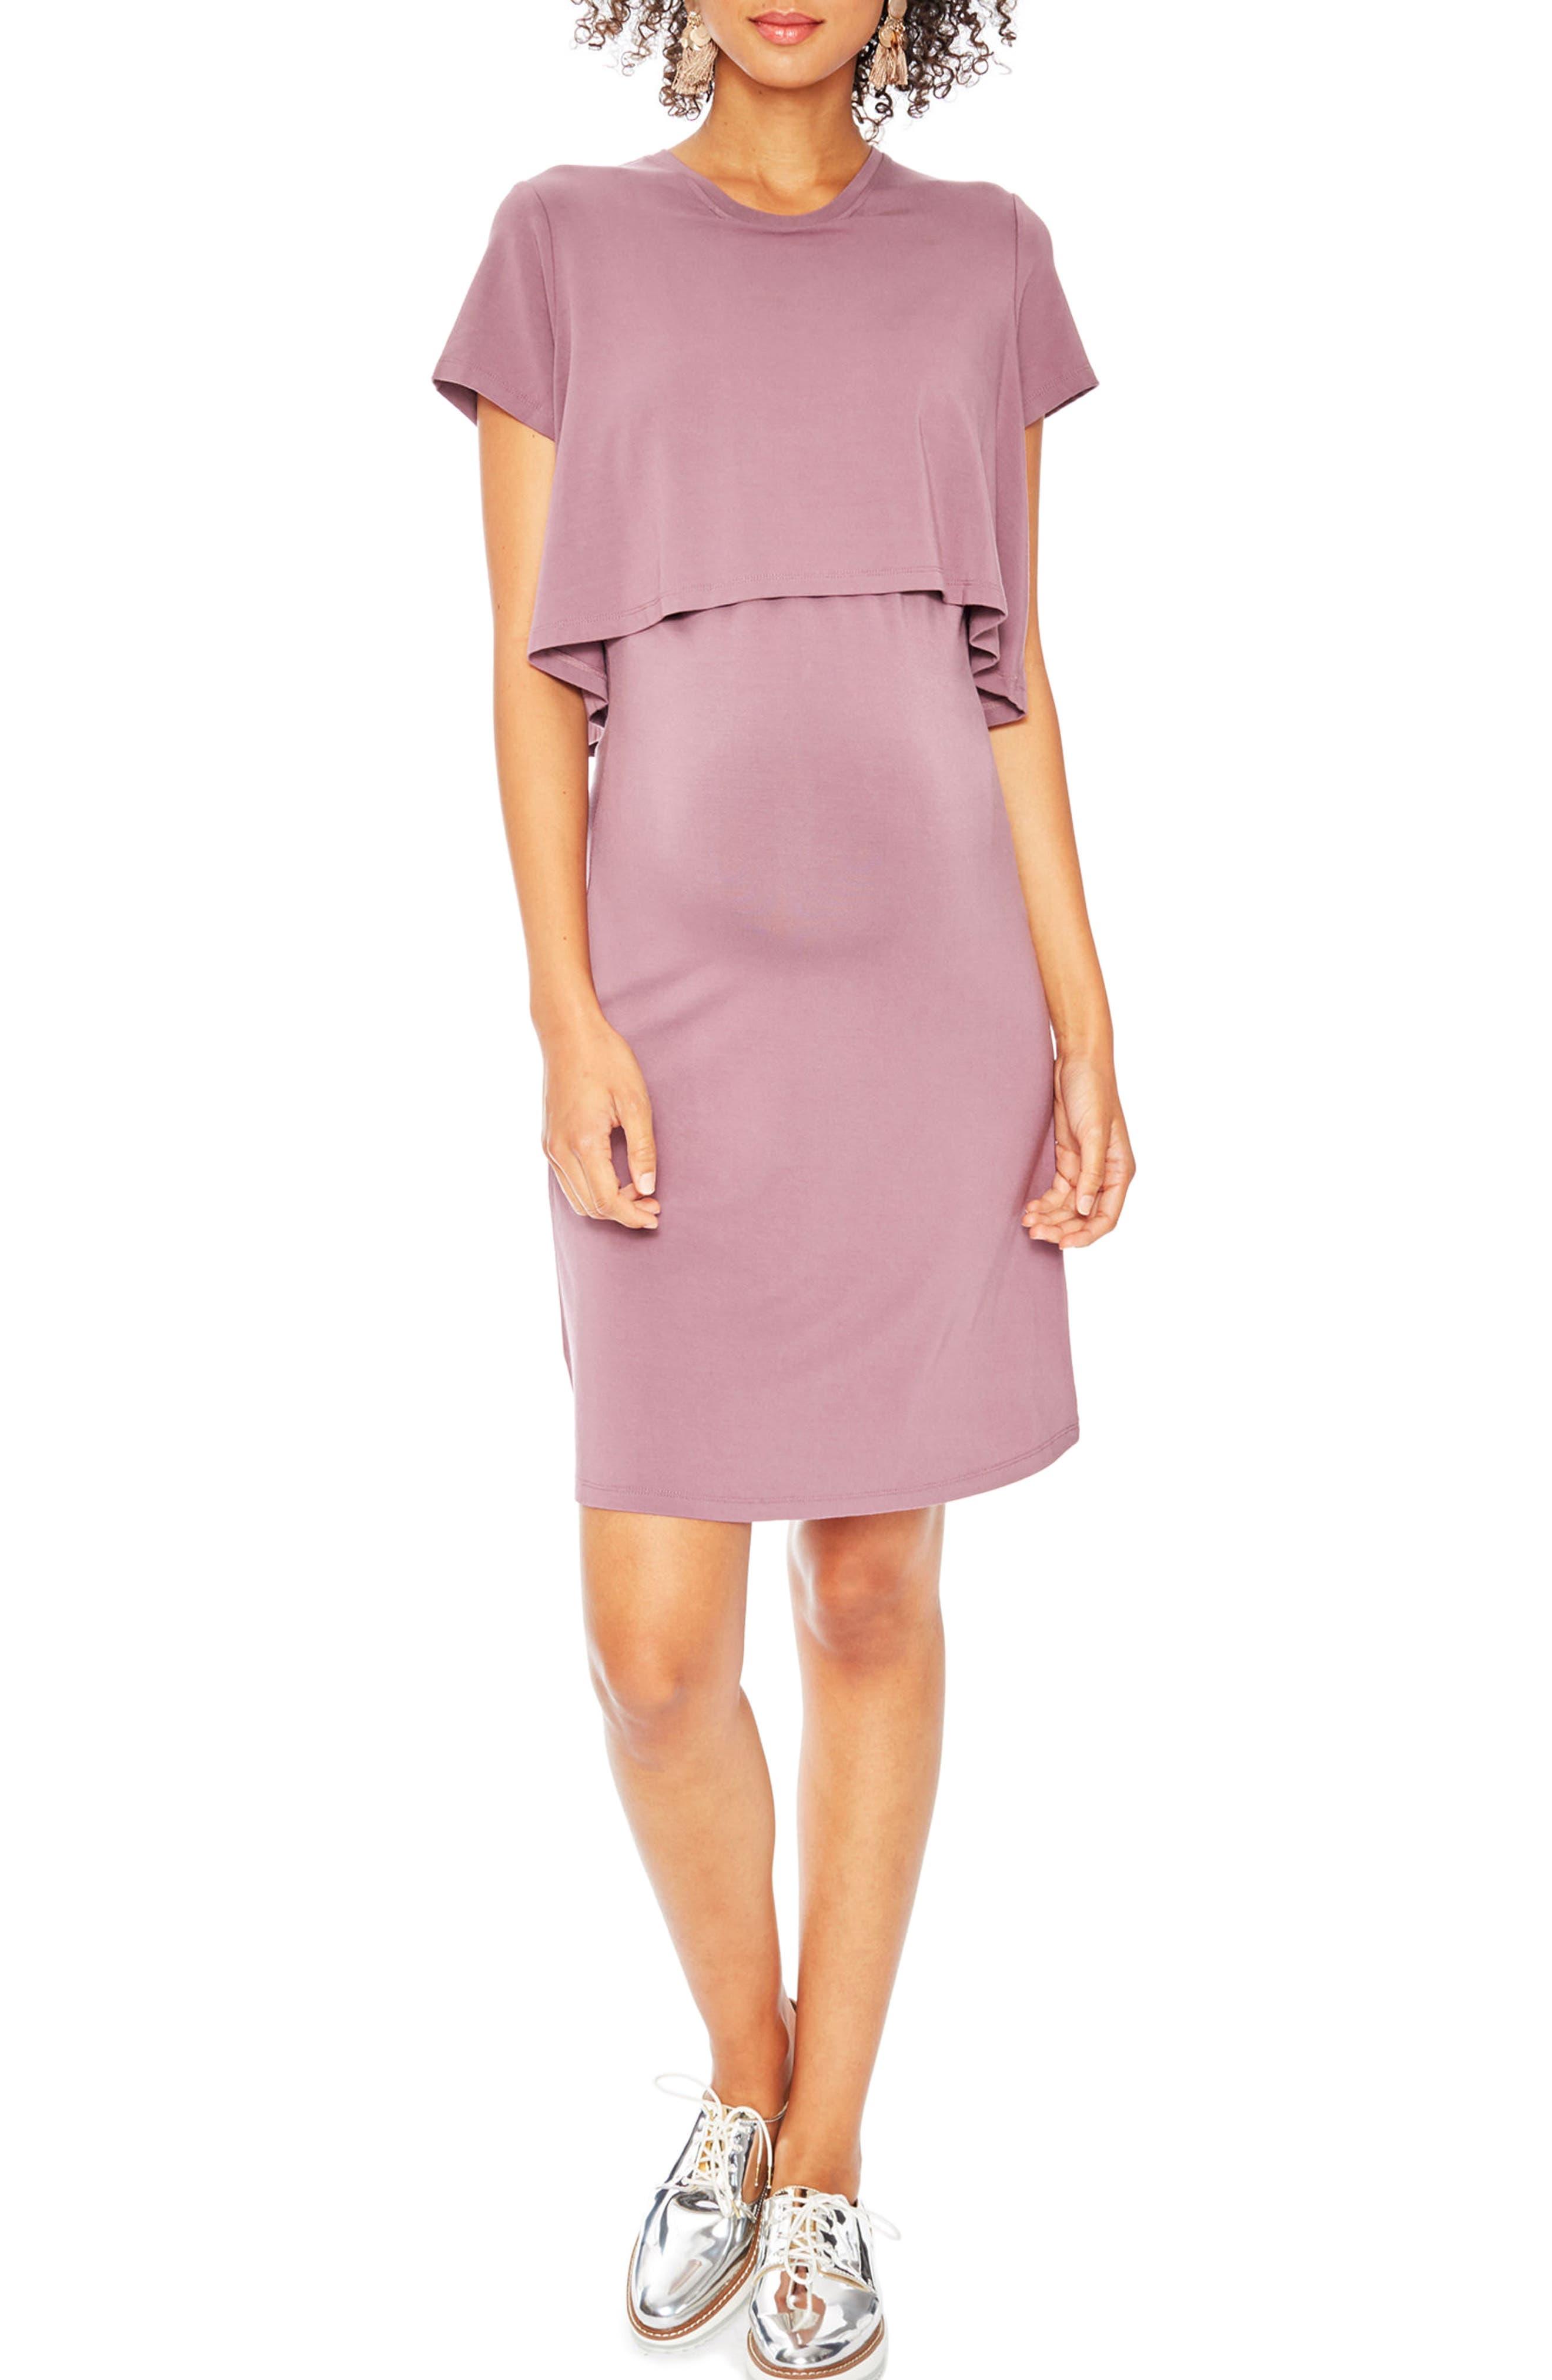 Anita Popover Maternity Dress,                         Main,                         color, 680